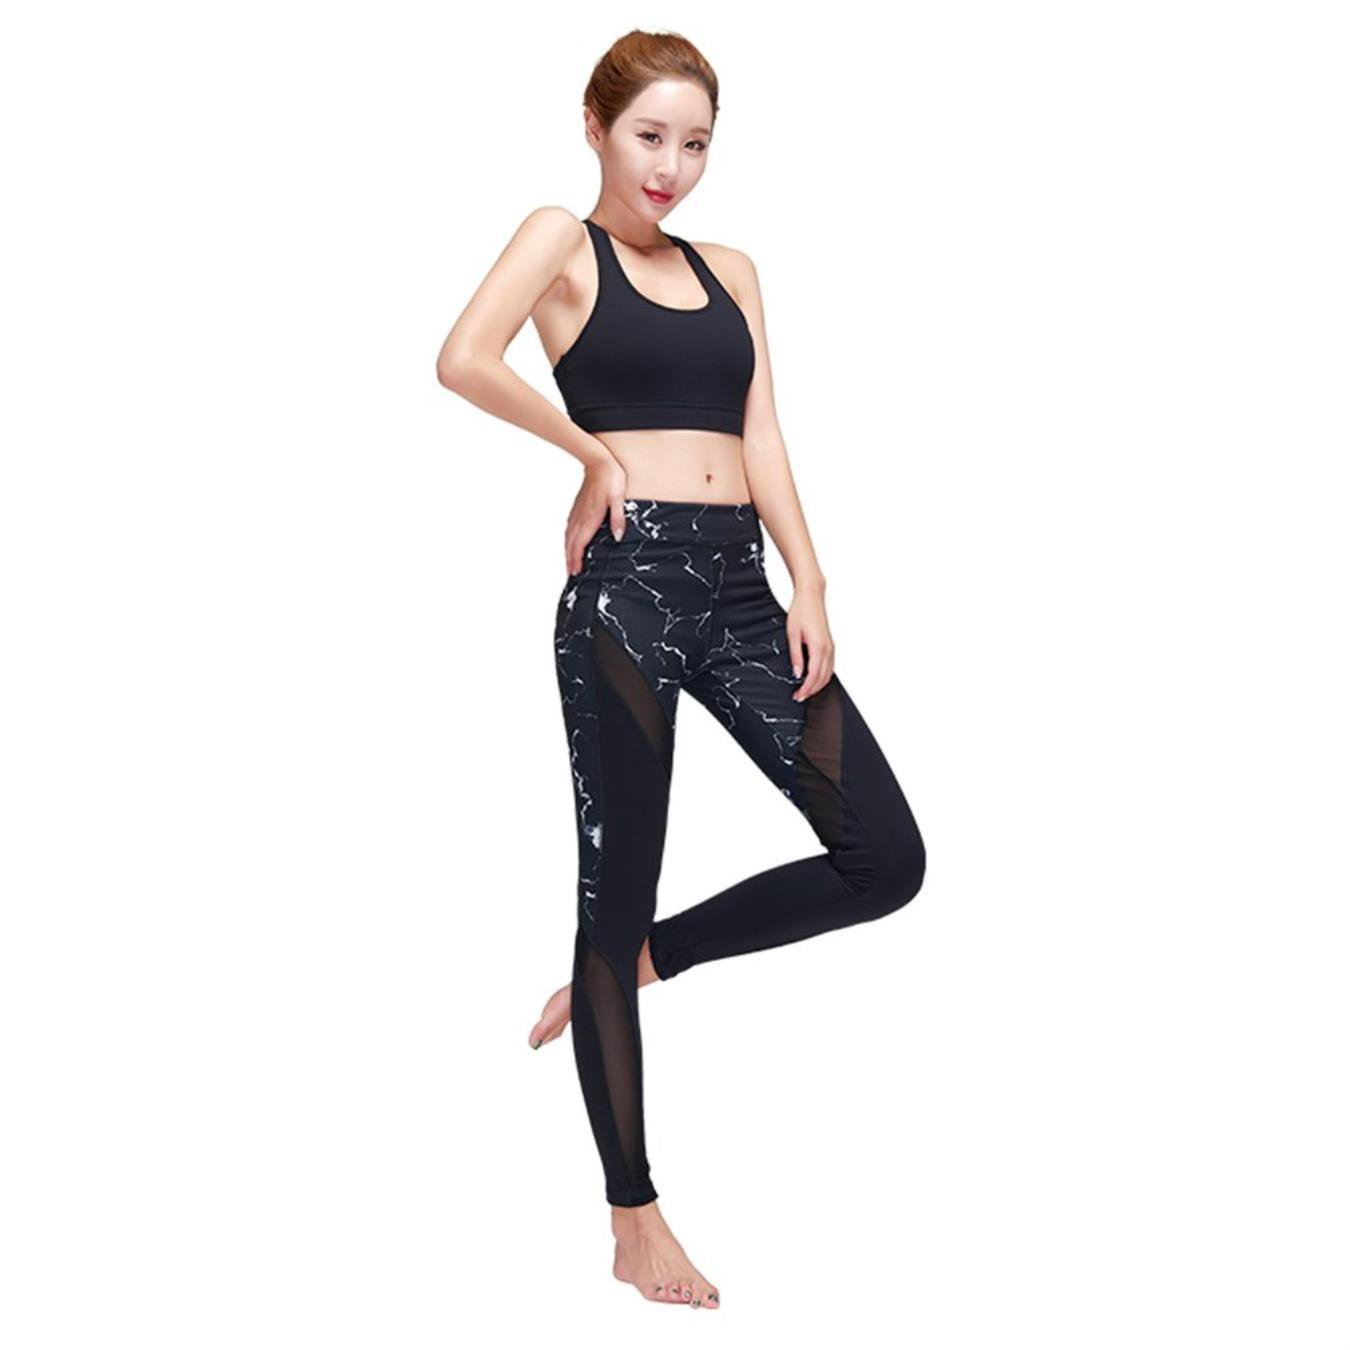 TUONFC Women Sexy Sports Bra Long Pants Set Back Hollow Out Elastic Yoga Clothing Push Up Bra